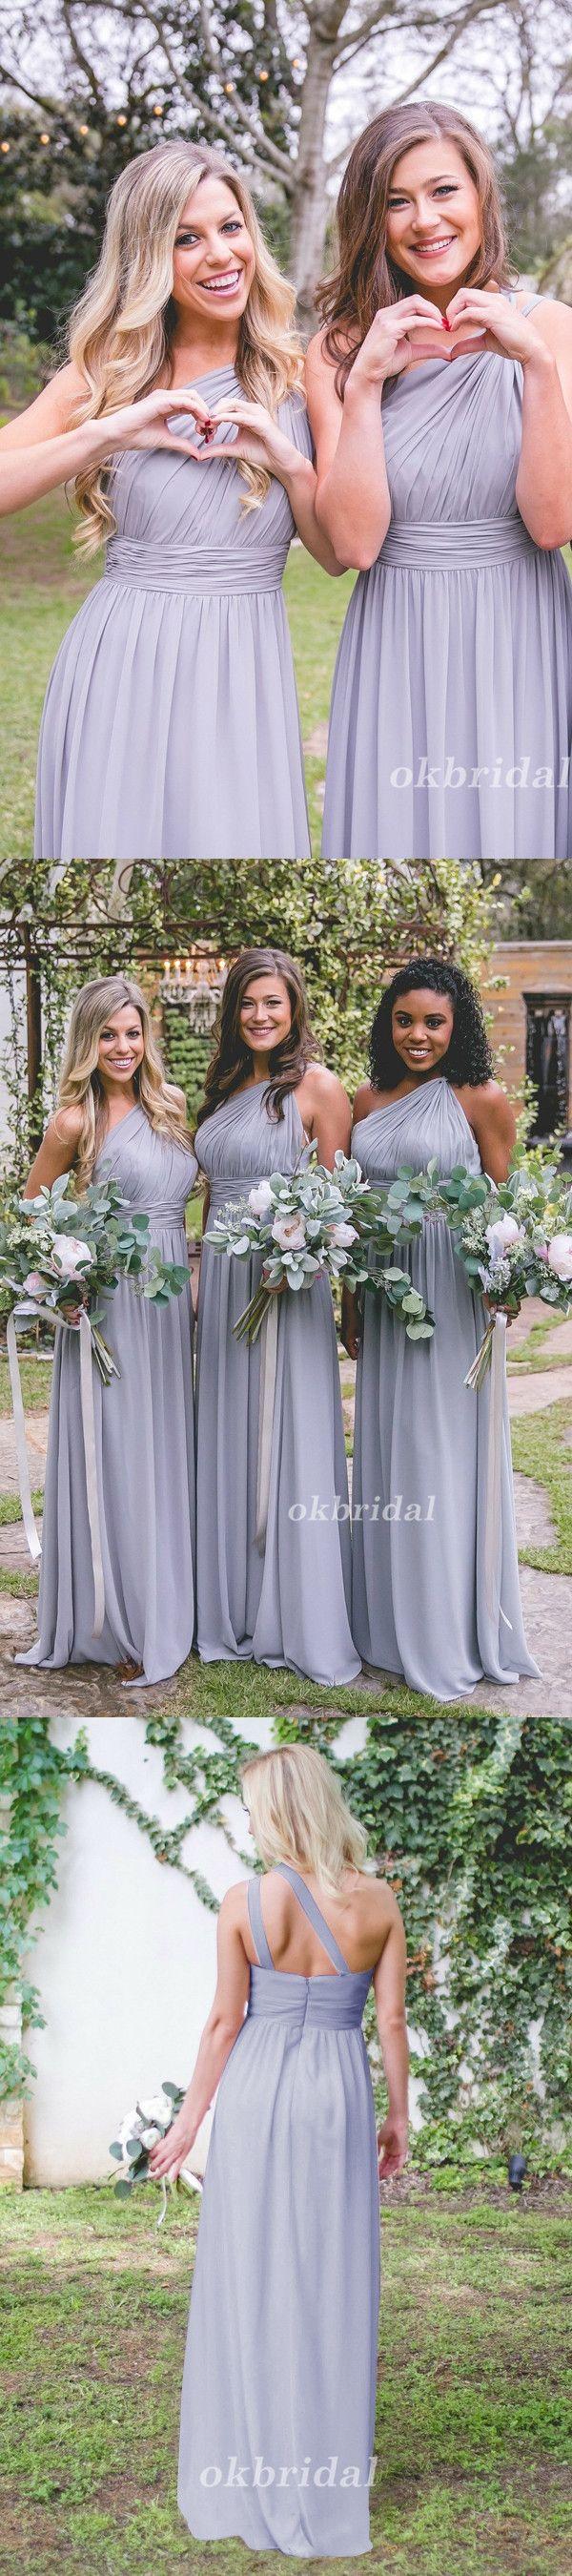 One Shoulder Bridesmaid Dress, Chiffon Bridesmaid Dress, A-Line Bridesmaid Dress, Dress for Wedding, Floor-Length Bridesmaid Dress, LB0860 #okbridal #bridesmaid